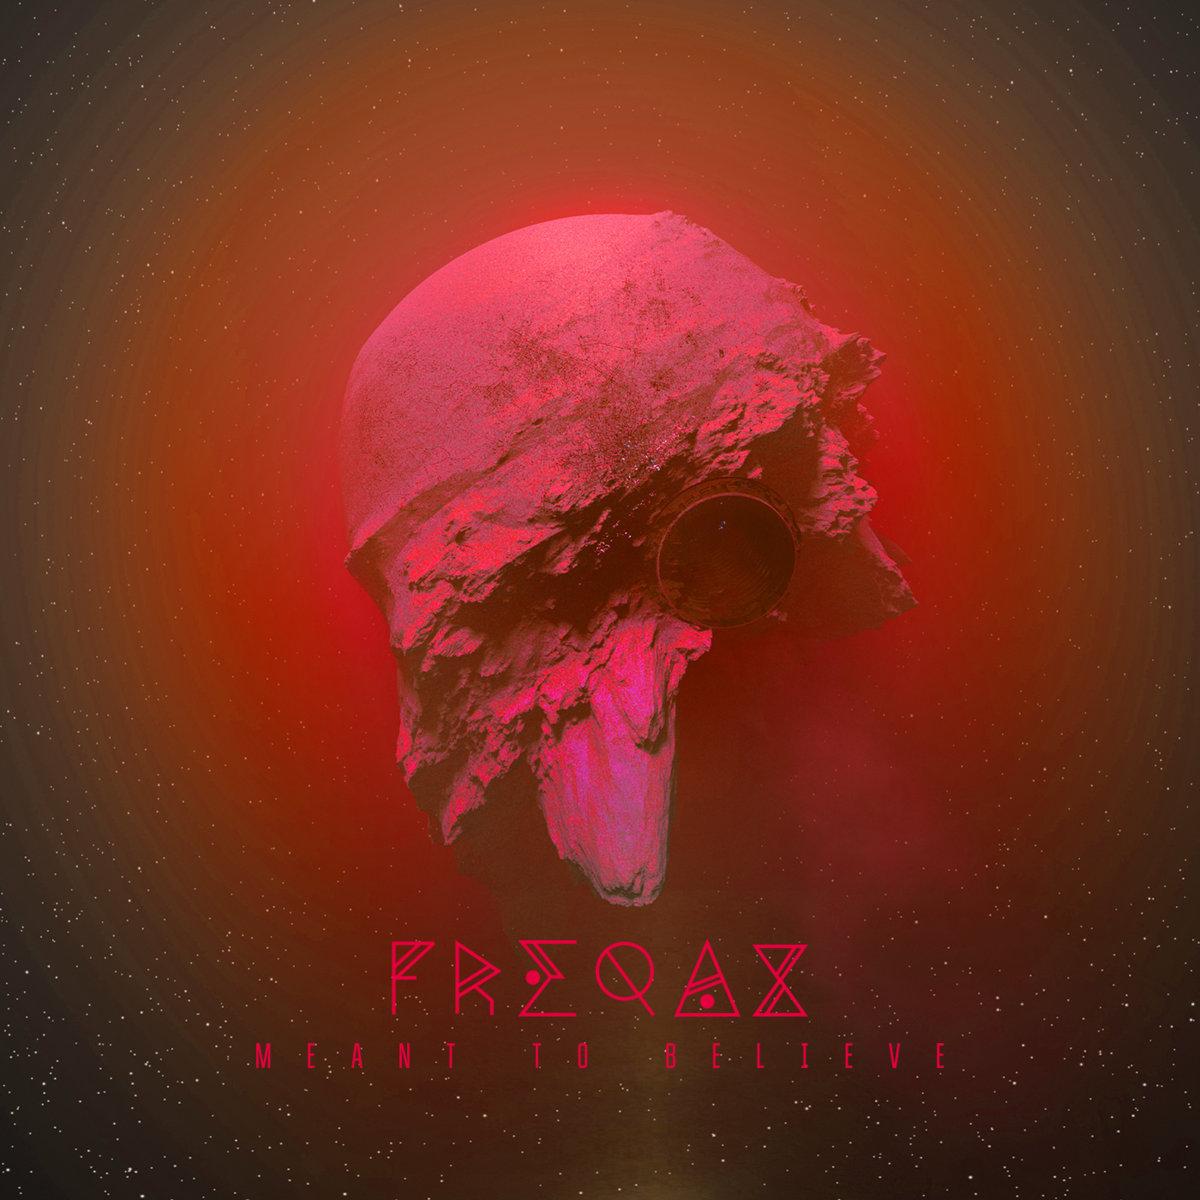 Freqax - Meant To Believe